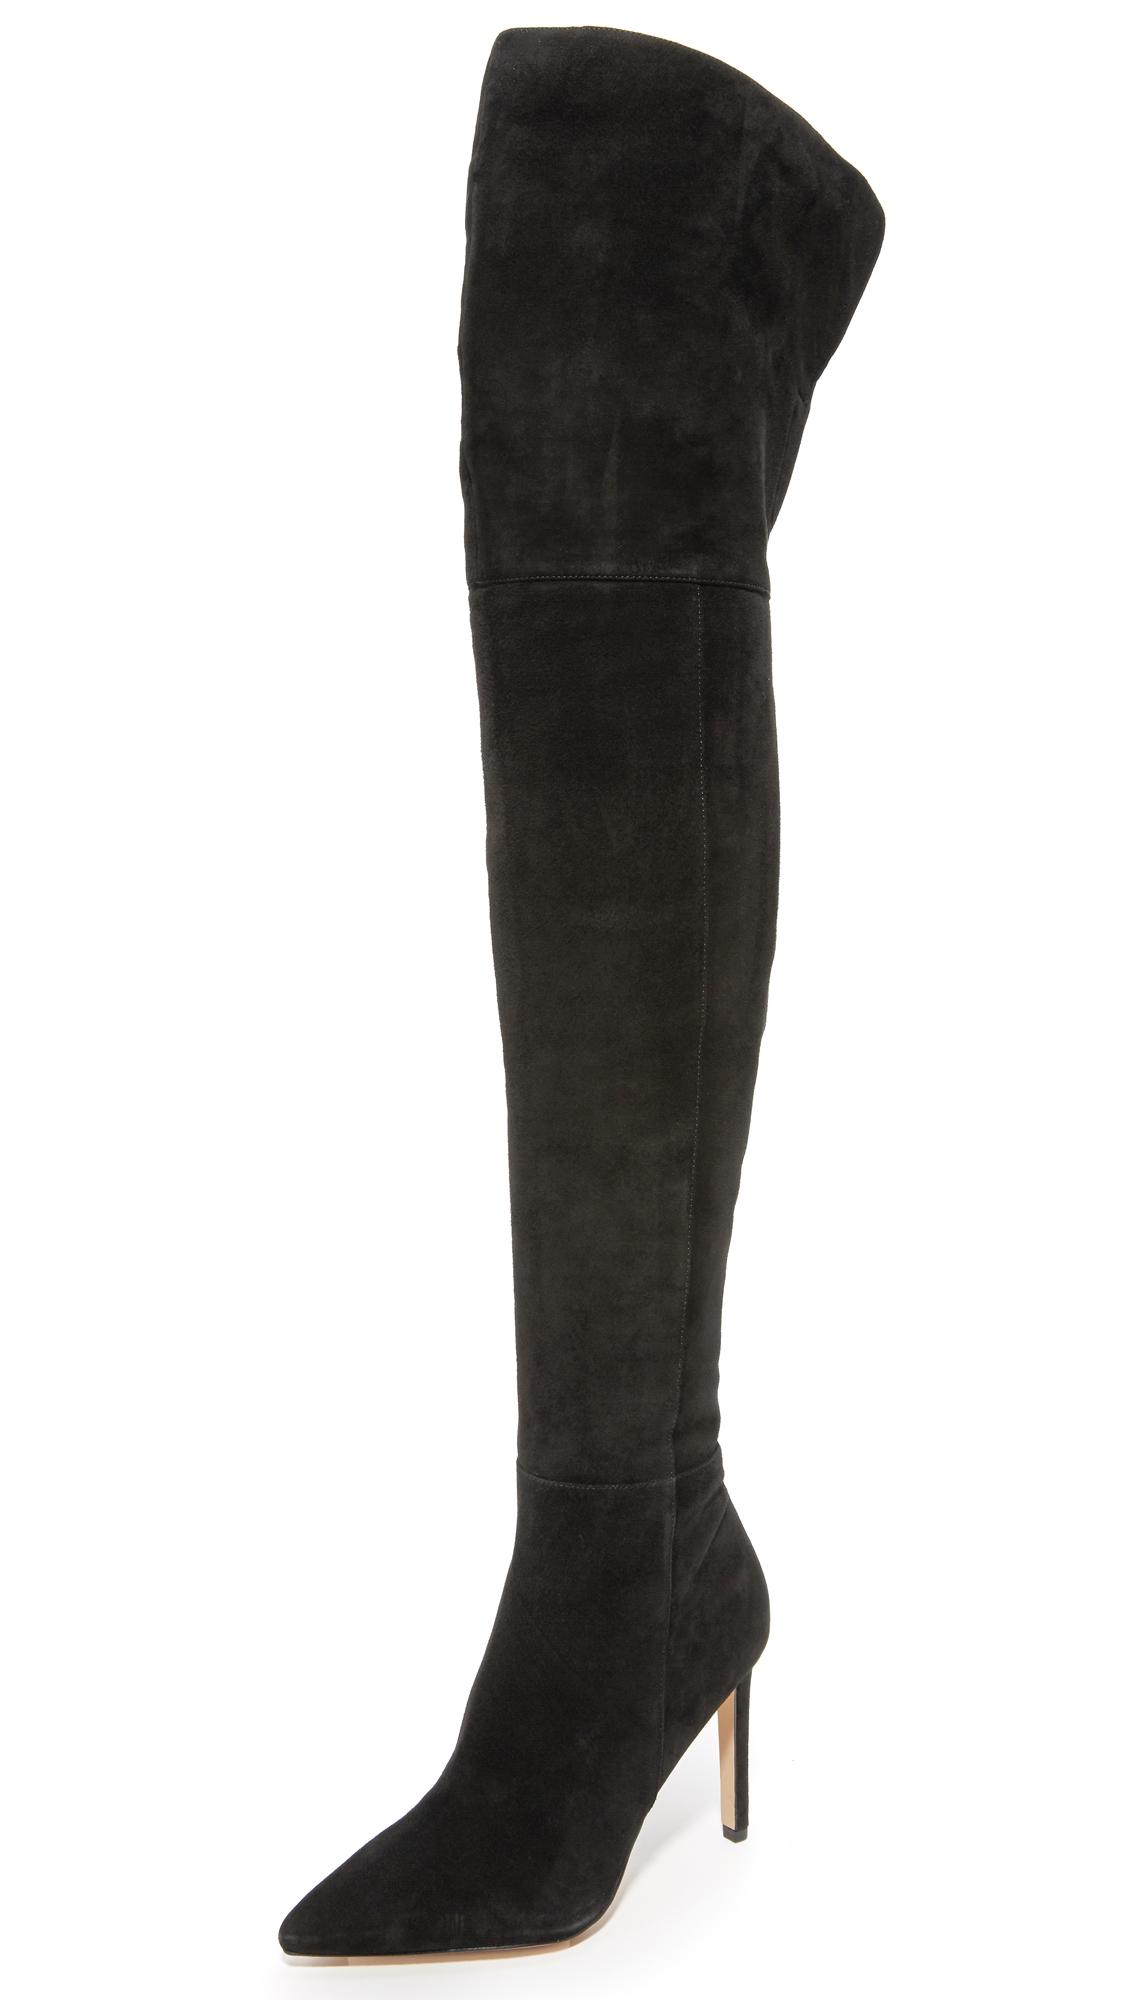 Sam Edelman Bernadette Over The Knee Boots - Black